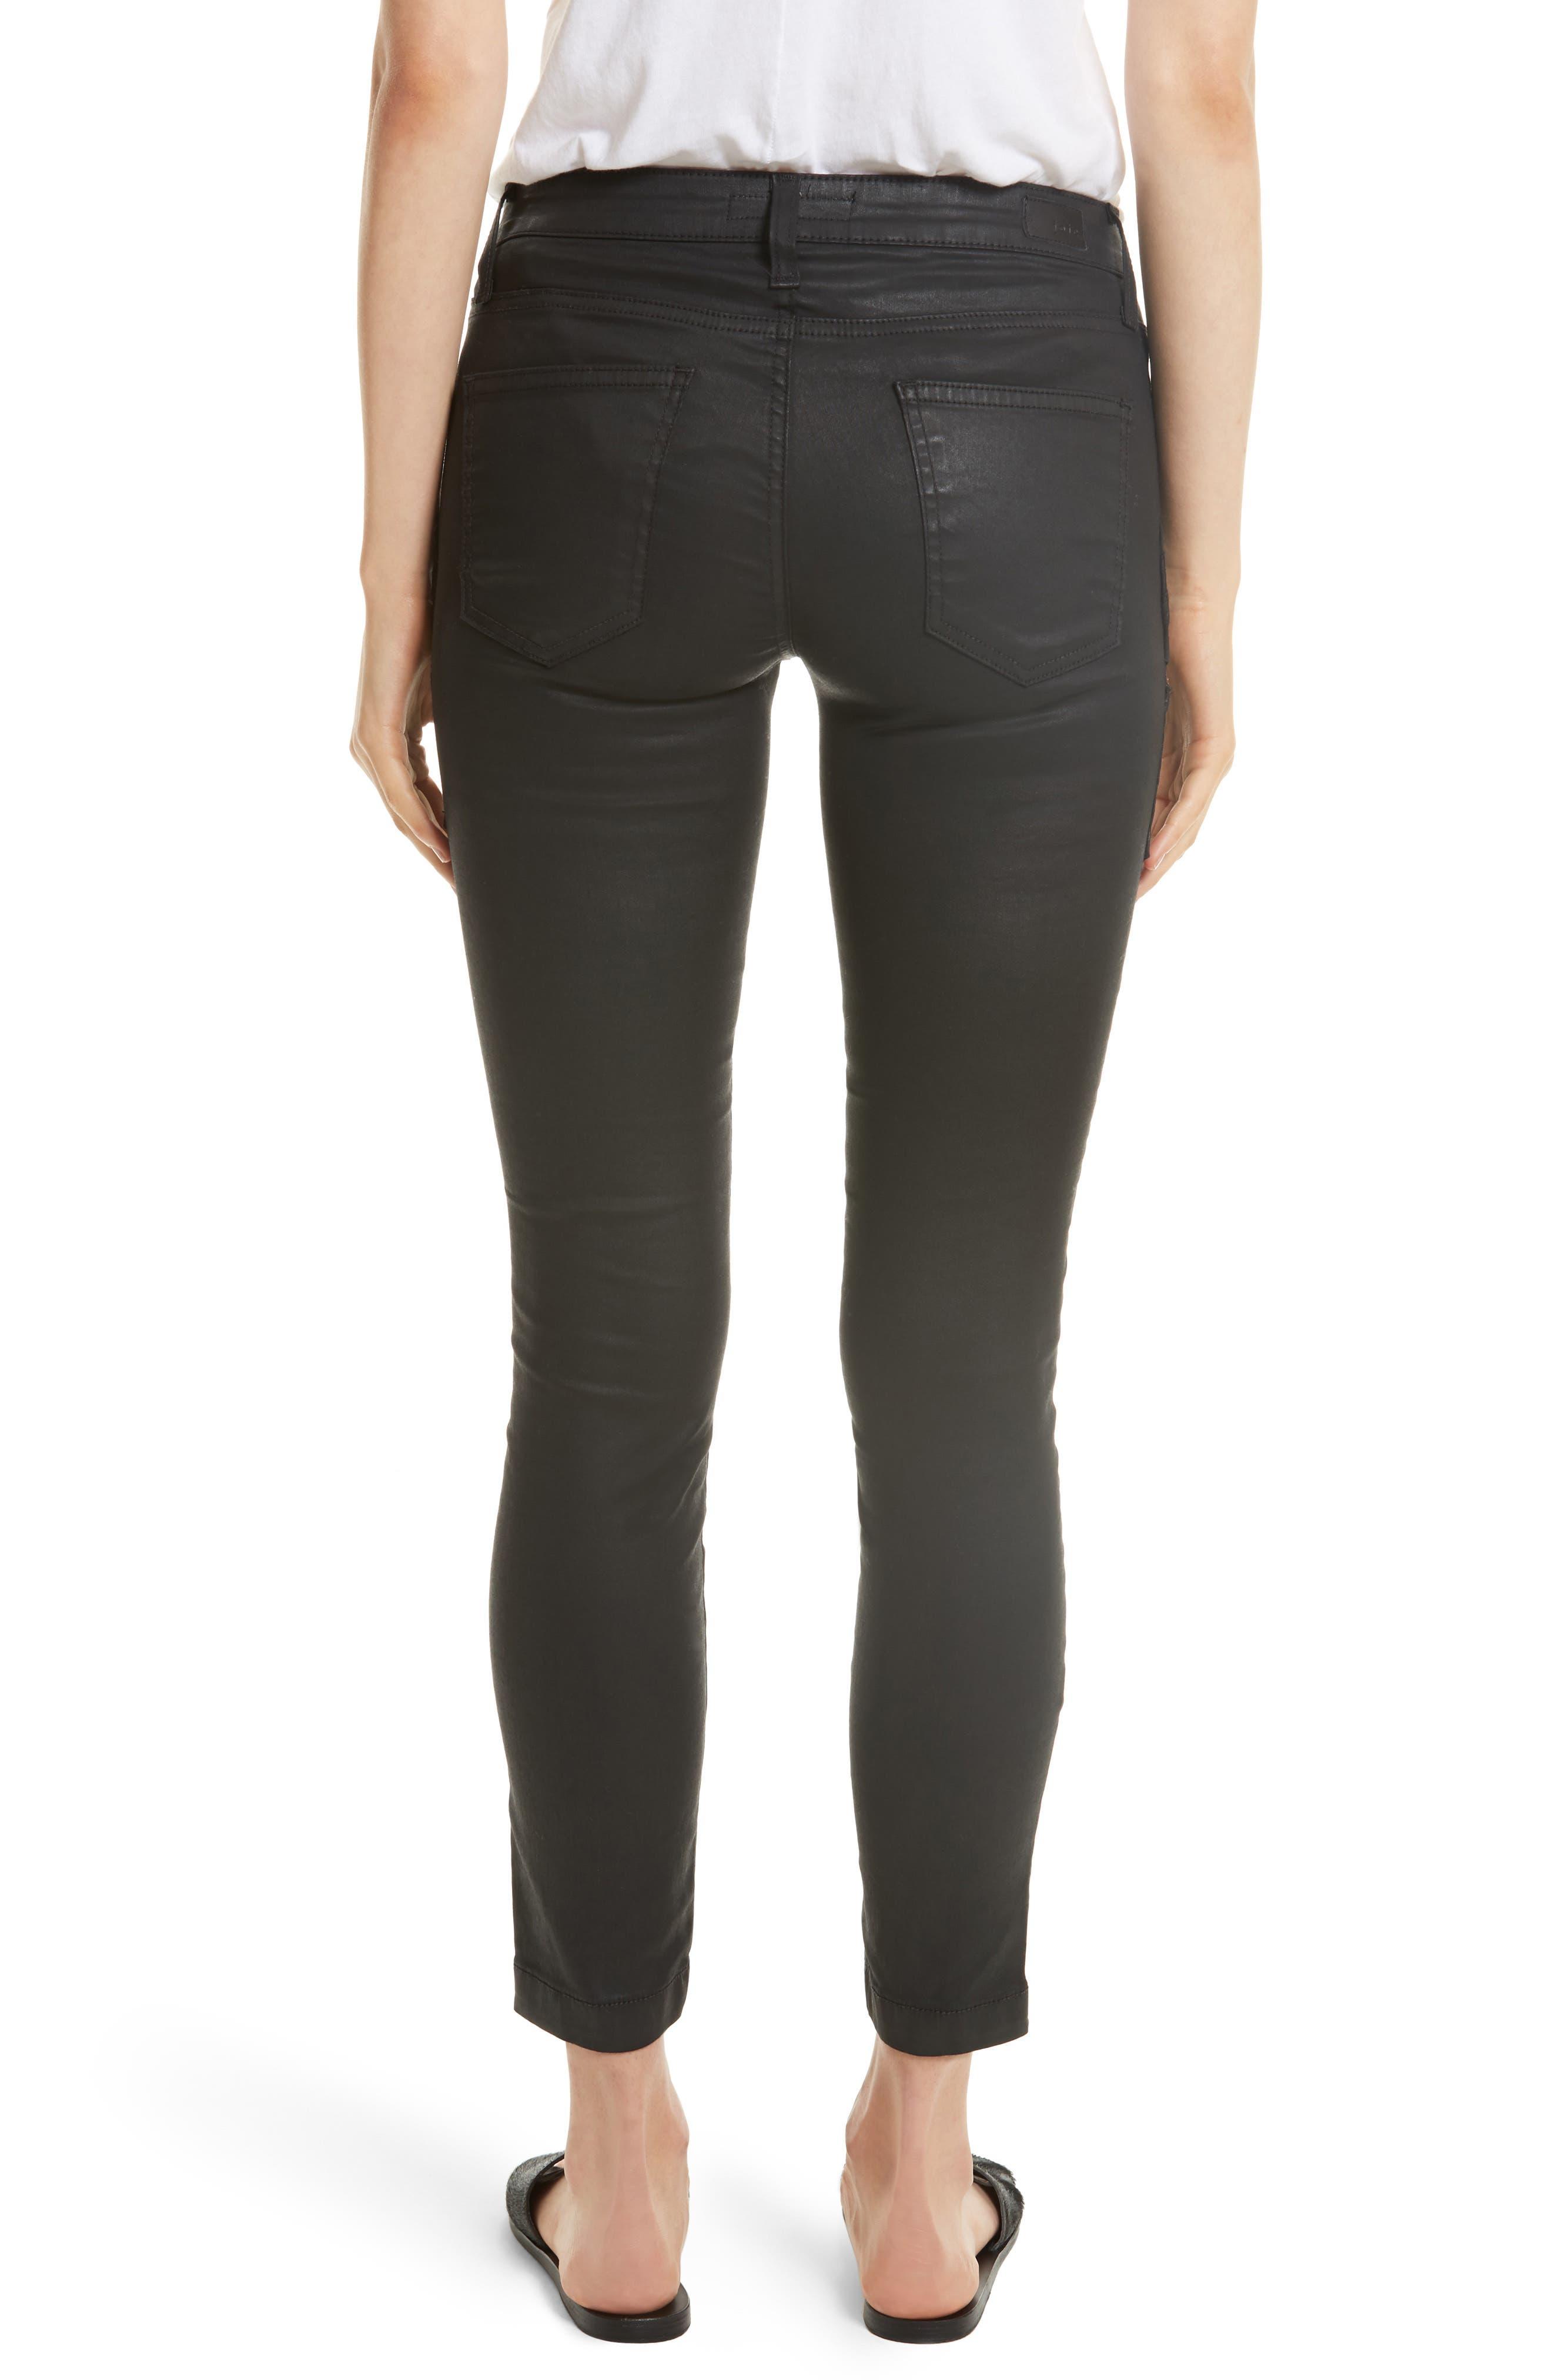 Park B Coated Skinny Jeans,                             Alternate thumbnail 2, color,                             Caviar